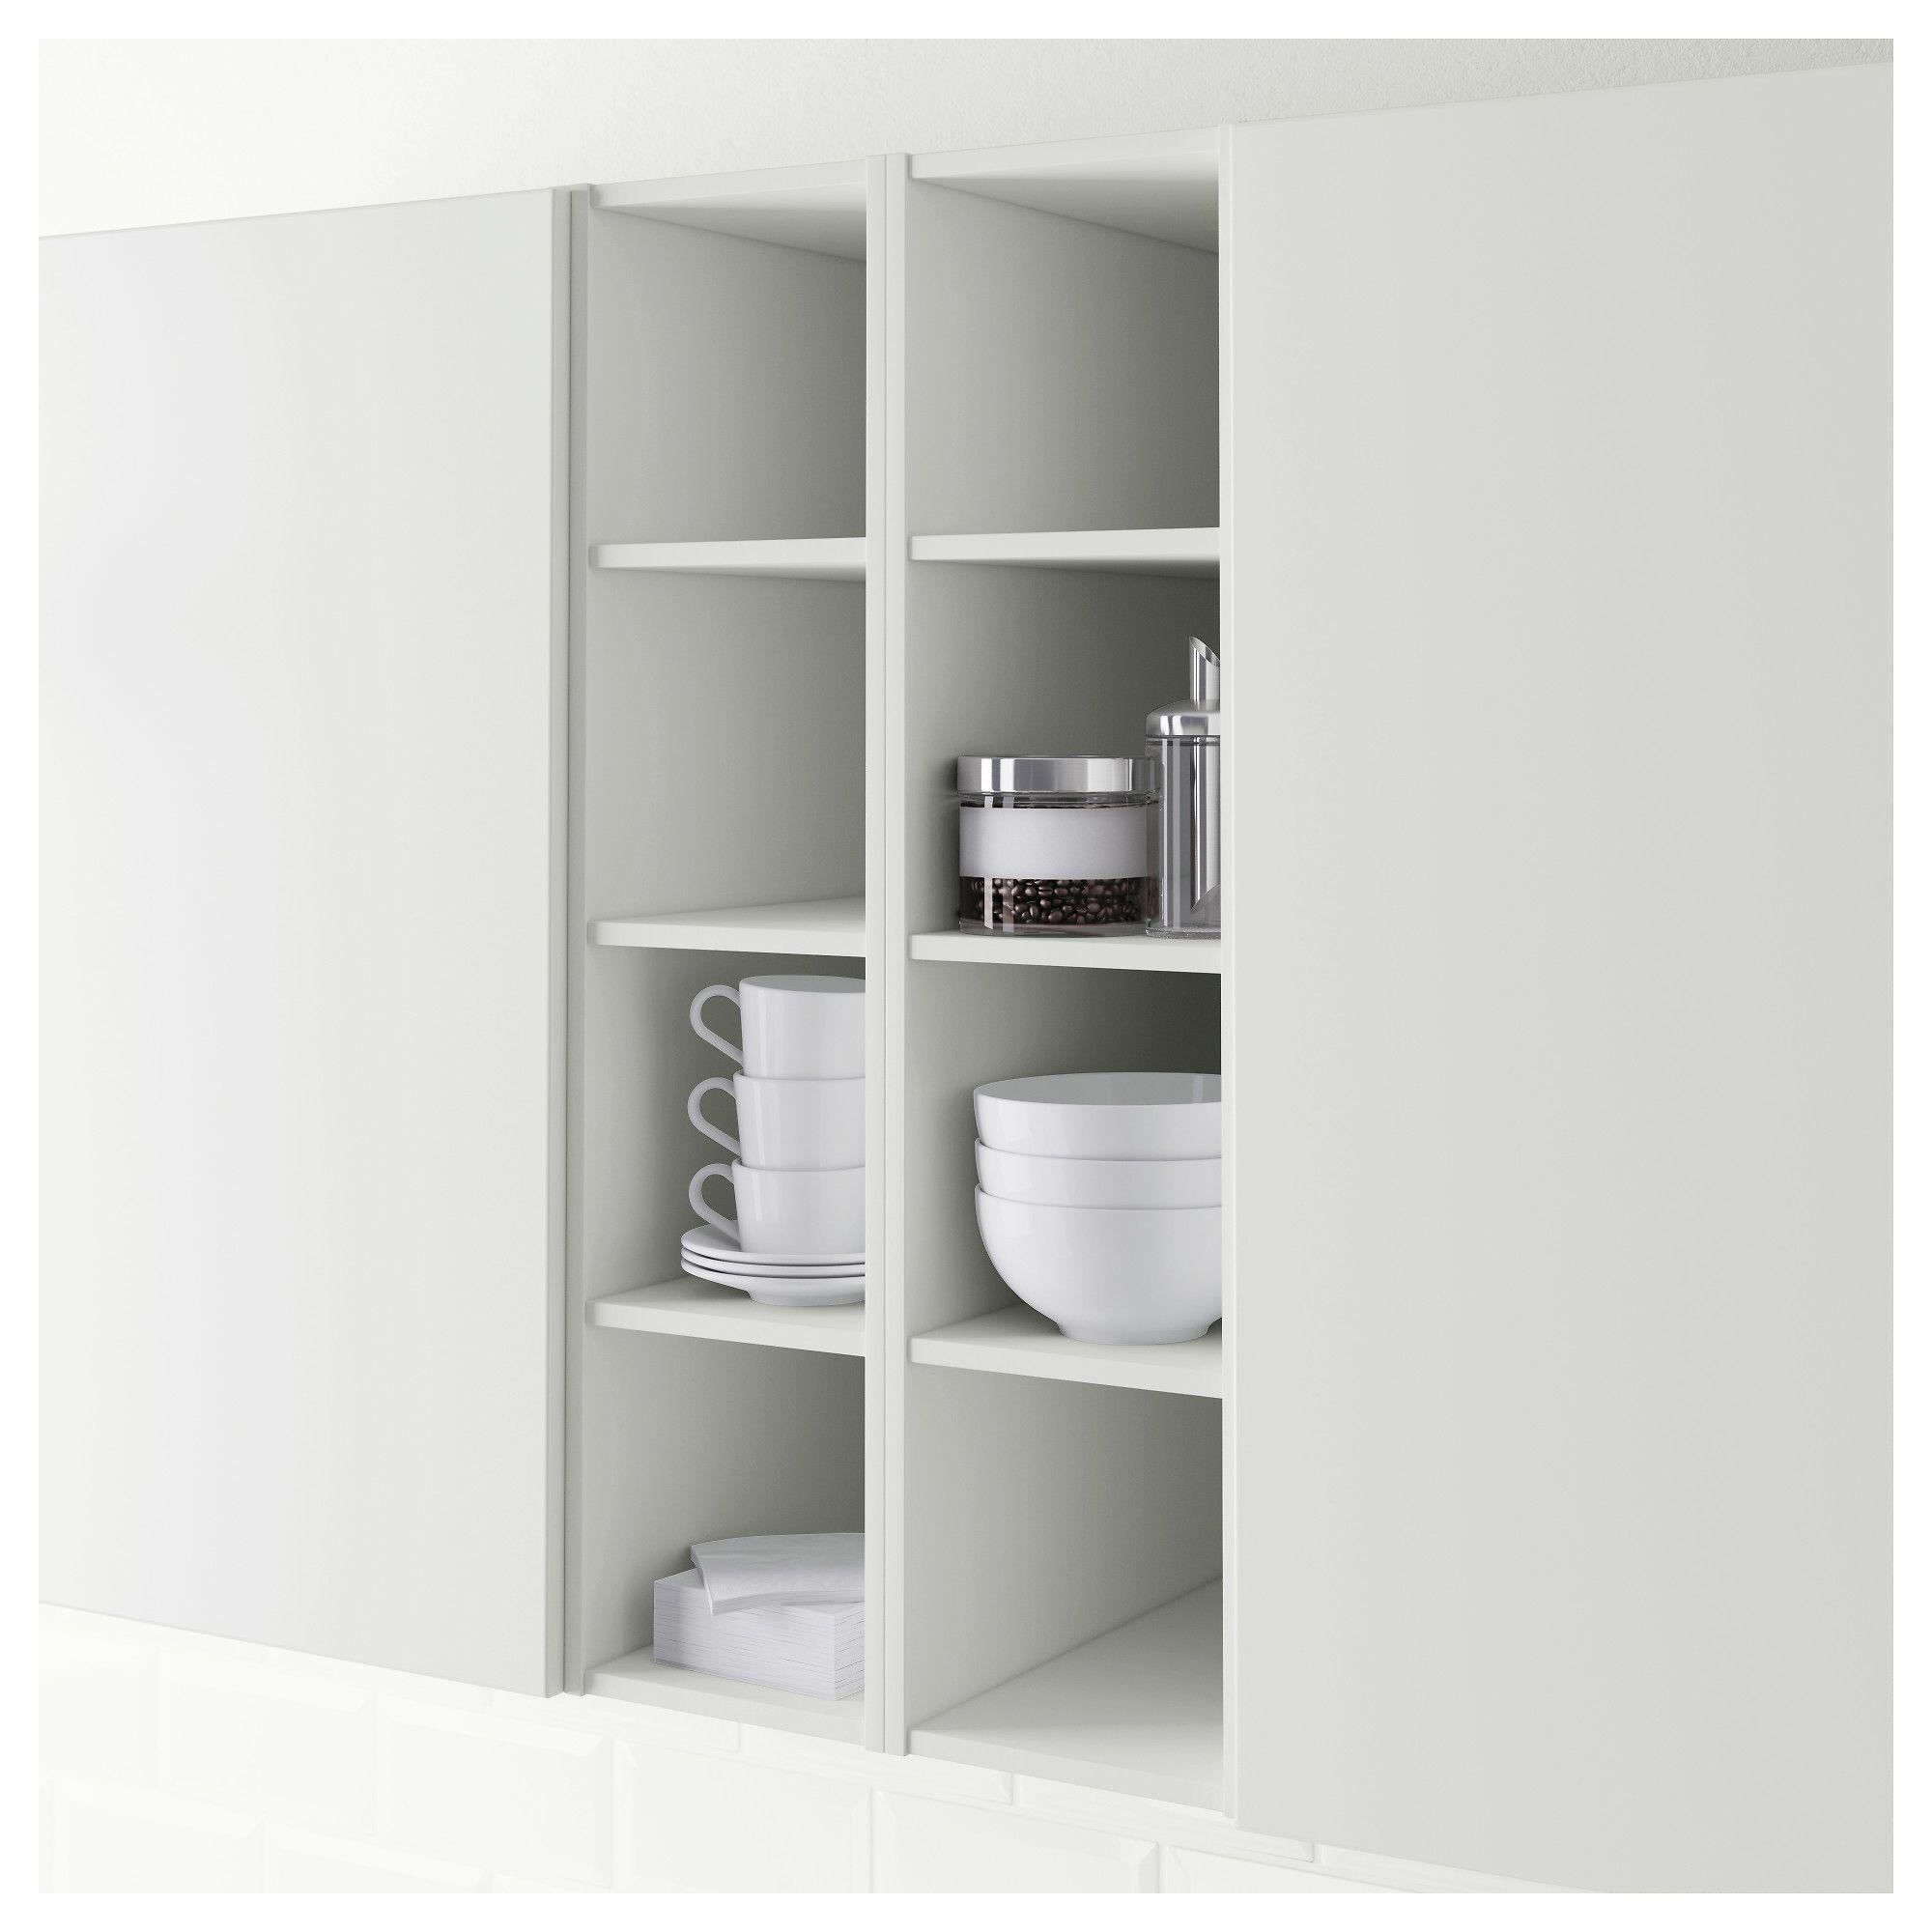 H–RDA Open cabinet White 20x37x80 cm